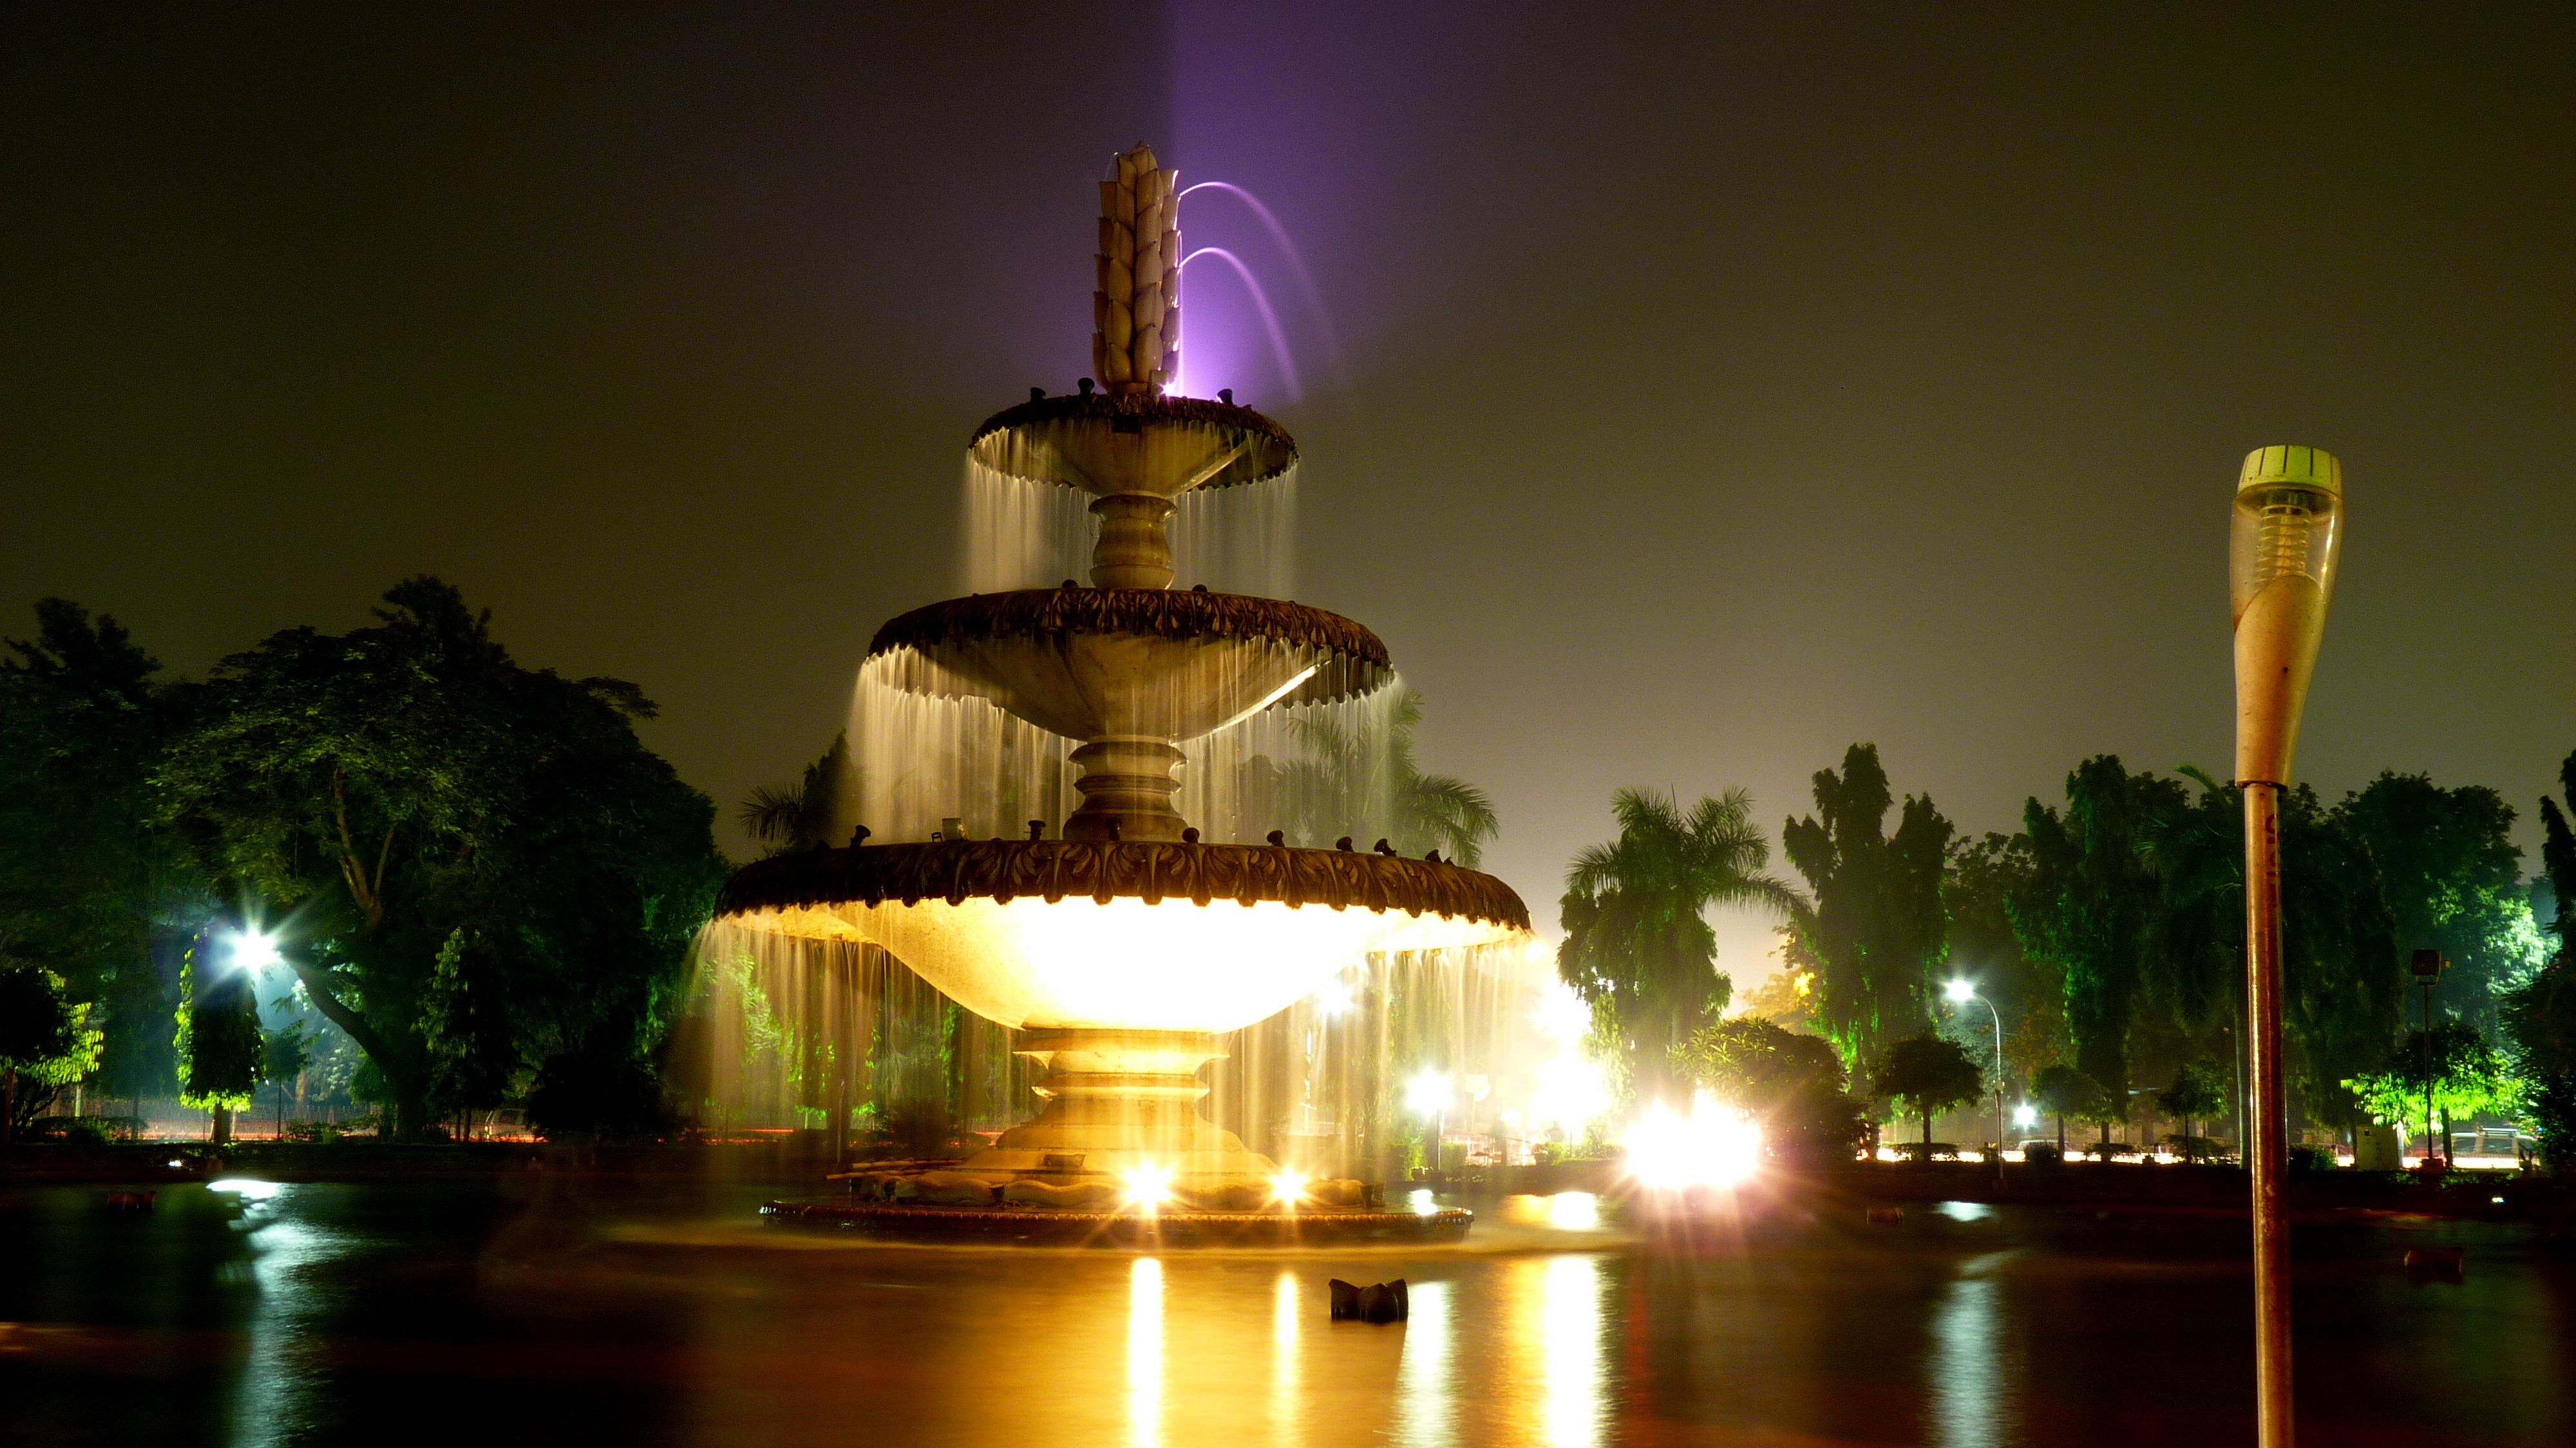 File:Sukhadia circle, Udaipur, Rajasthan.jpg - Wikimedia Commons